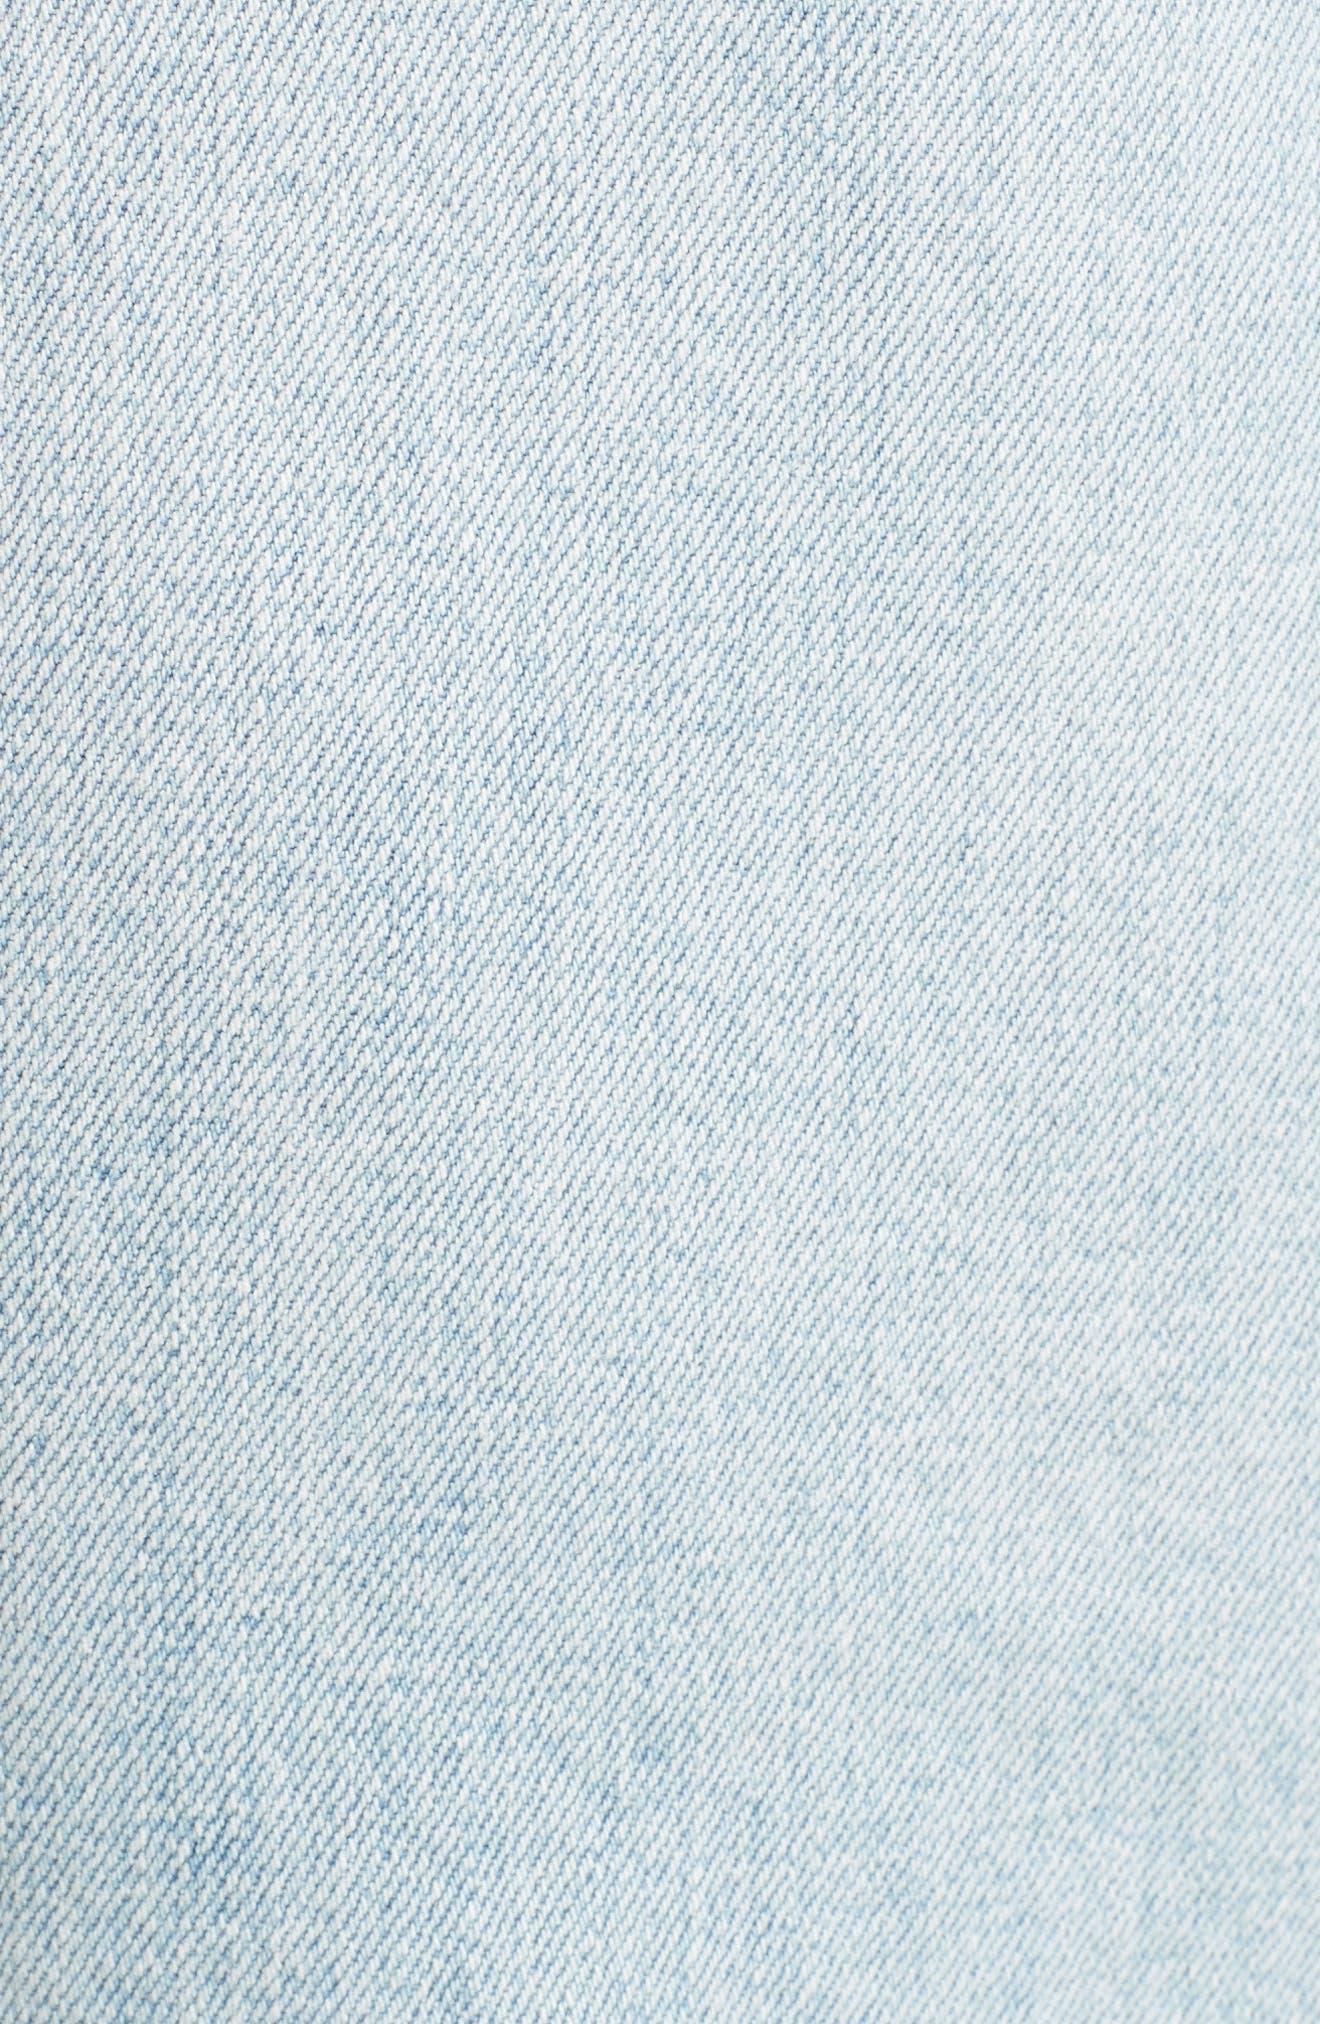 Tack Slim Fit Jeans,                             Alternate thumbnail 5, color,                             450